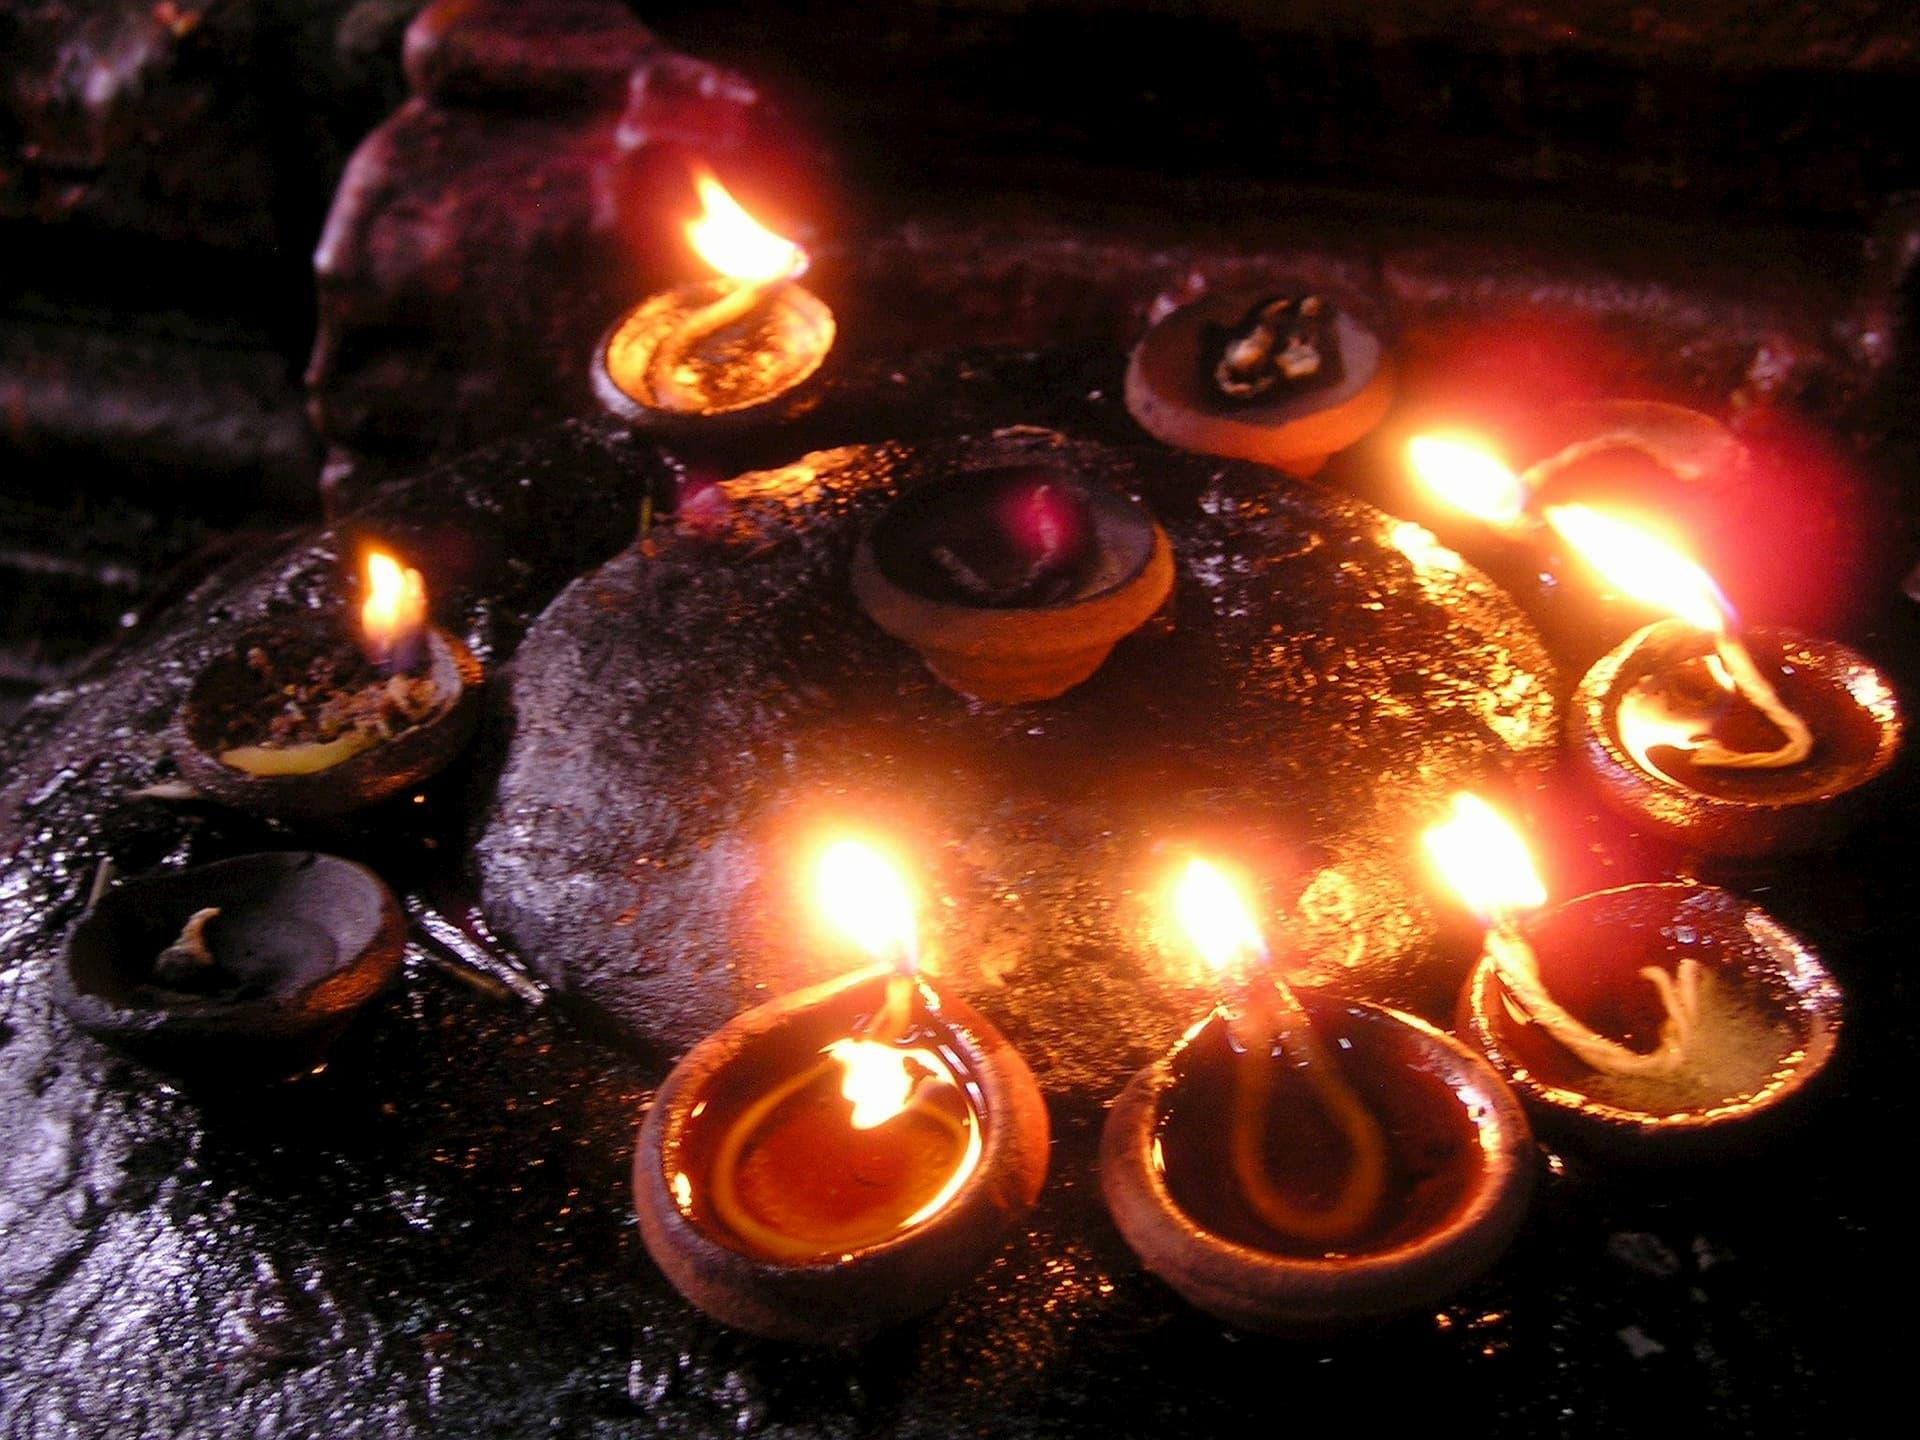 adventour - India - Gange prayer candles